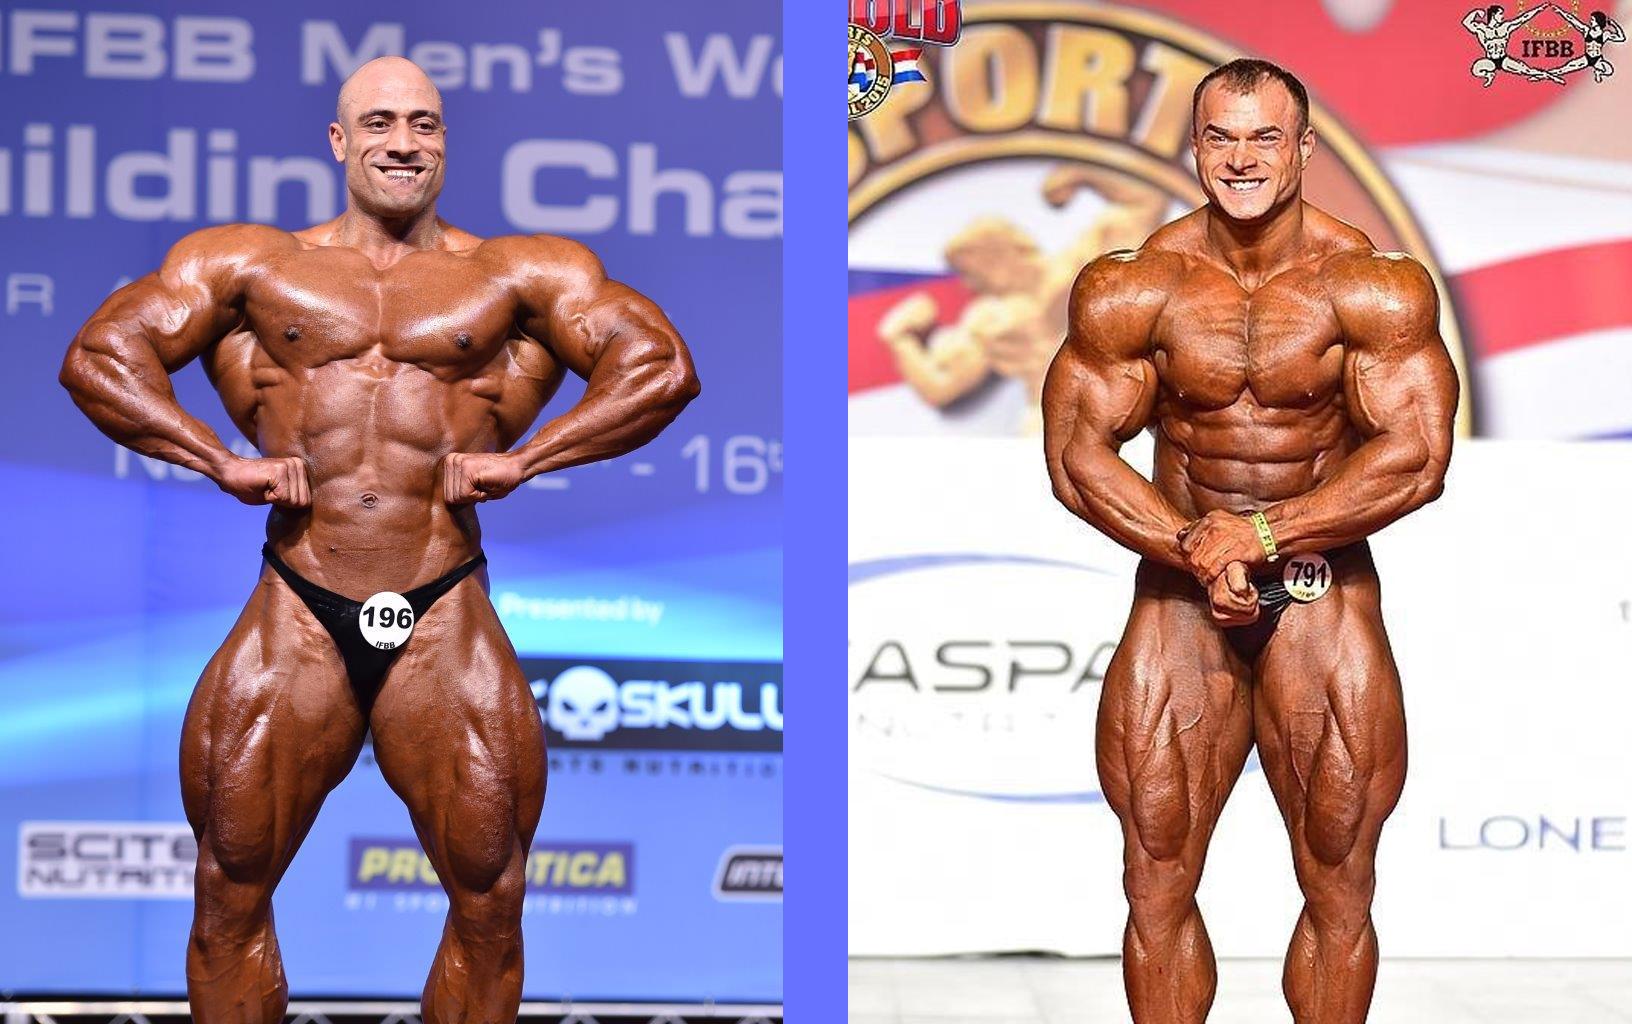 Attia Shaalan (Egypt) VS Sergey Kulaev (Russia)